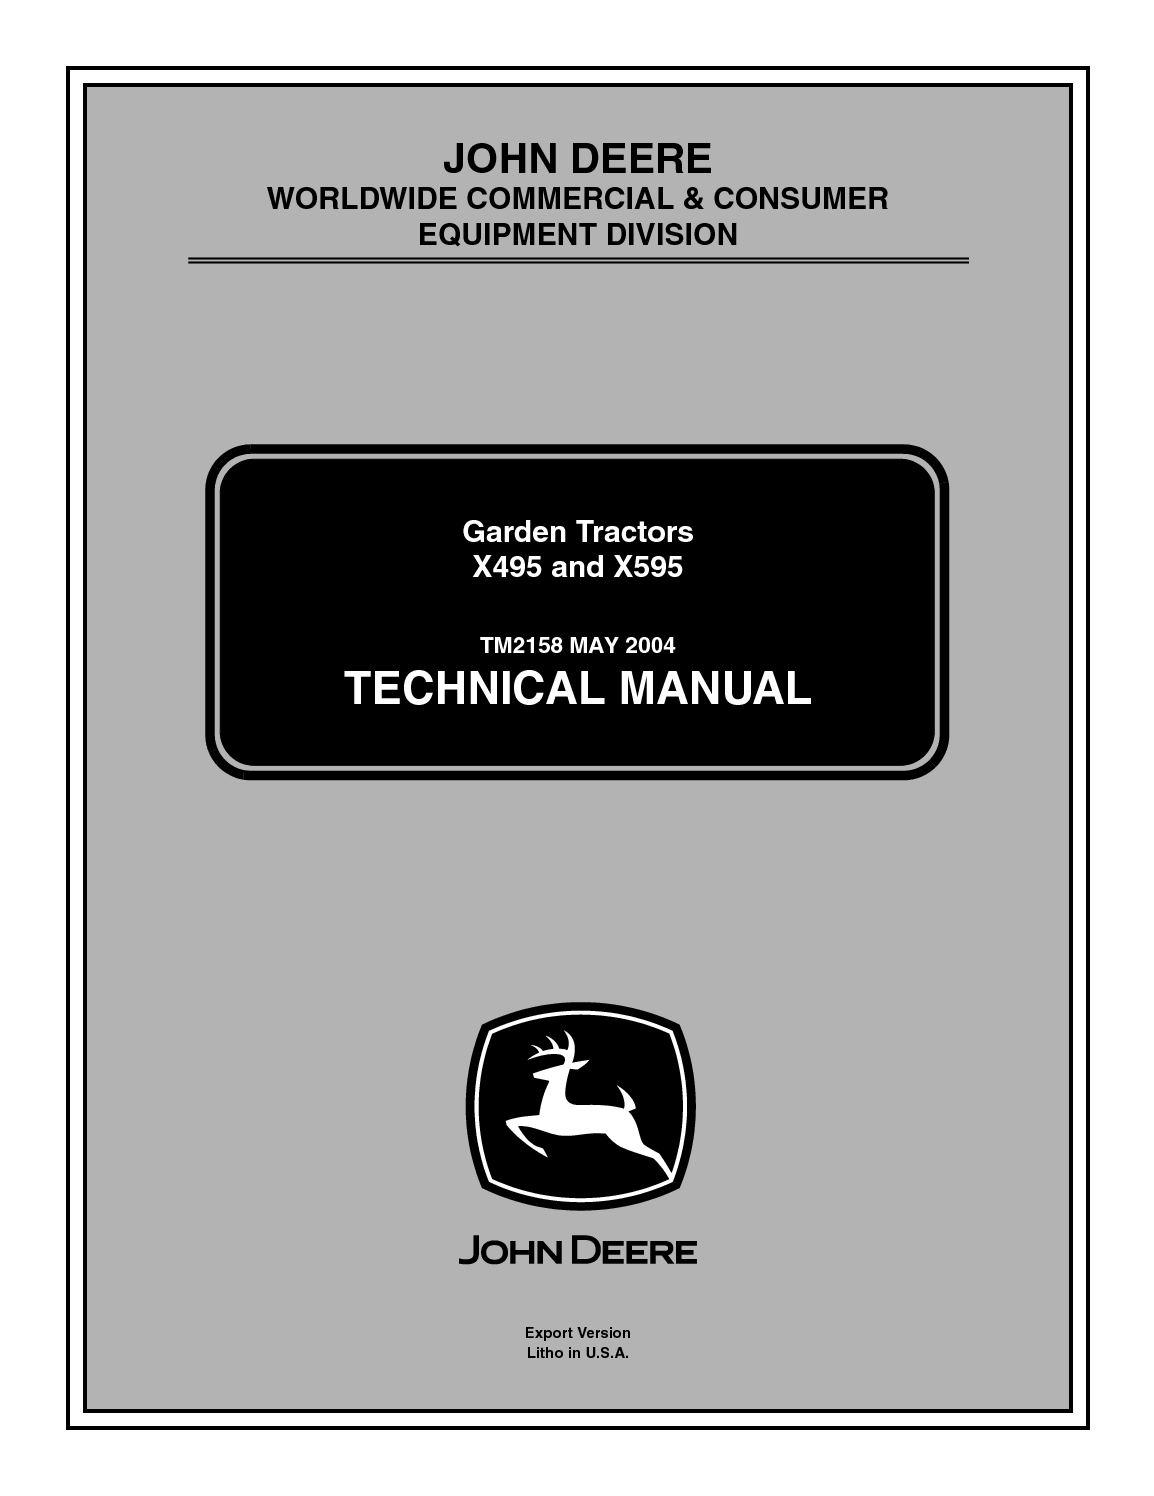 Calamo John Deere X495 Lawn Garden Tractor Service Repair Manual 270 Alternator Wiring Diagram